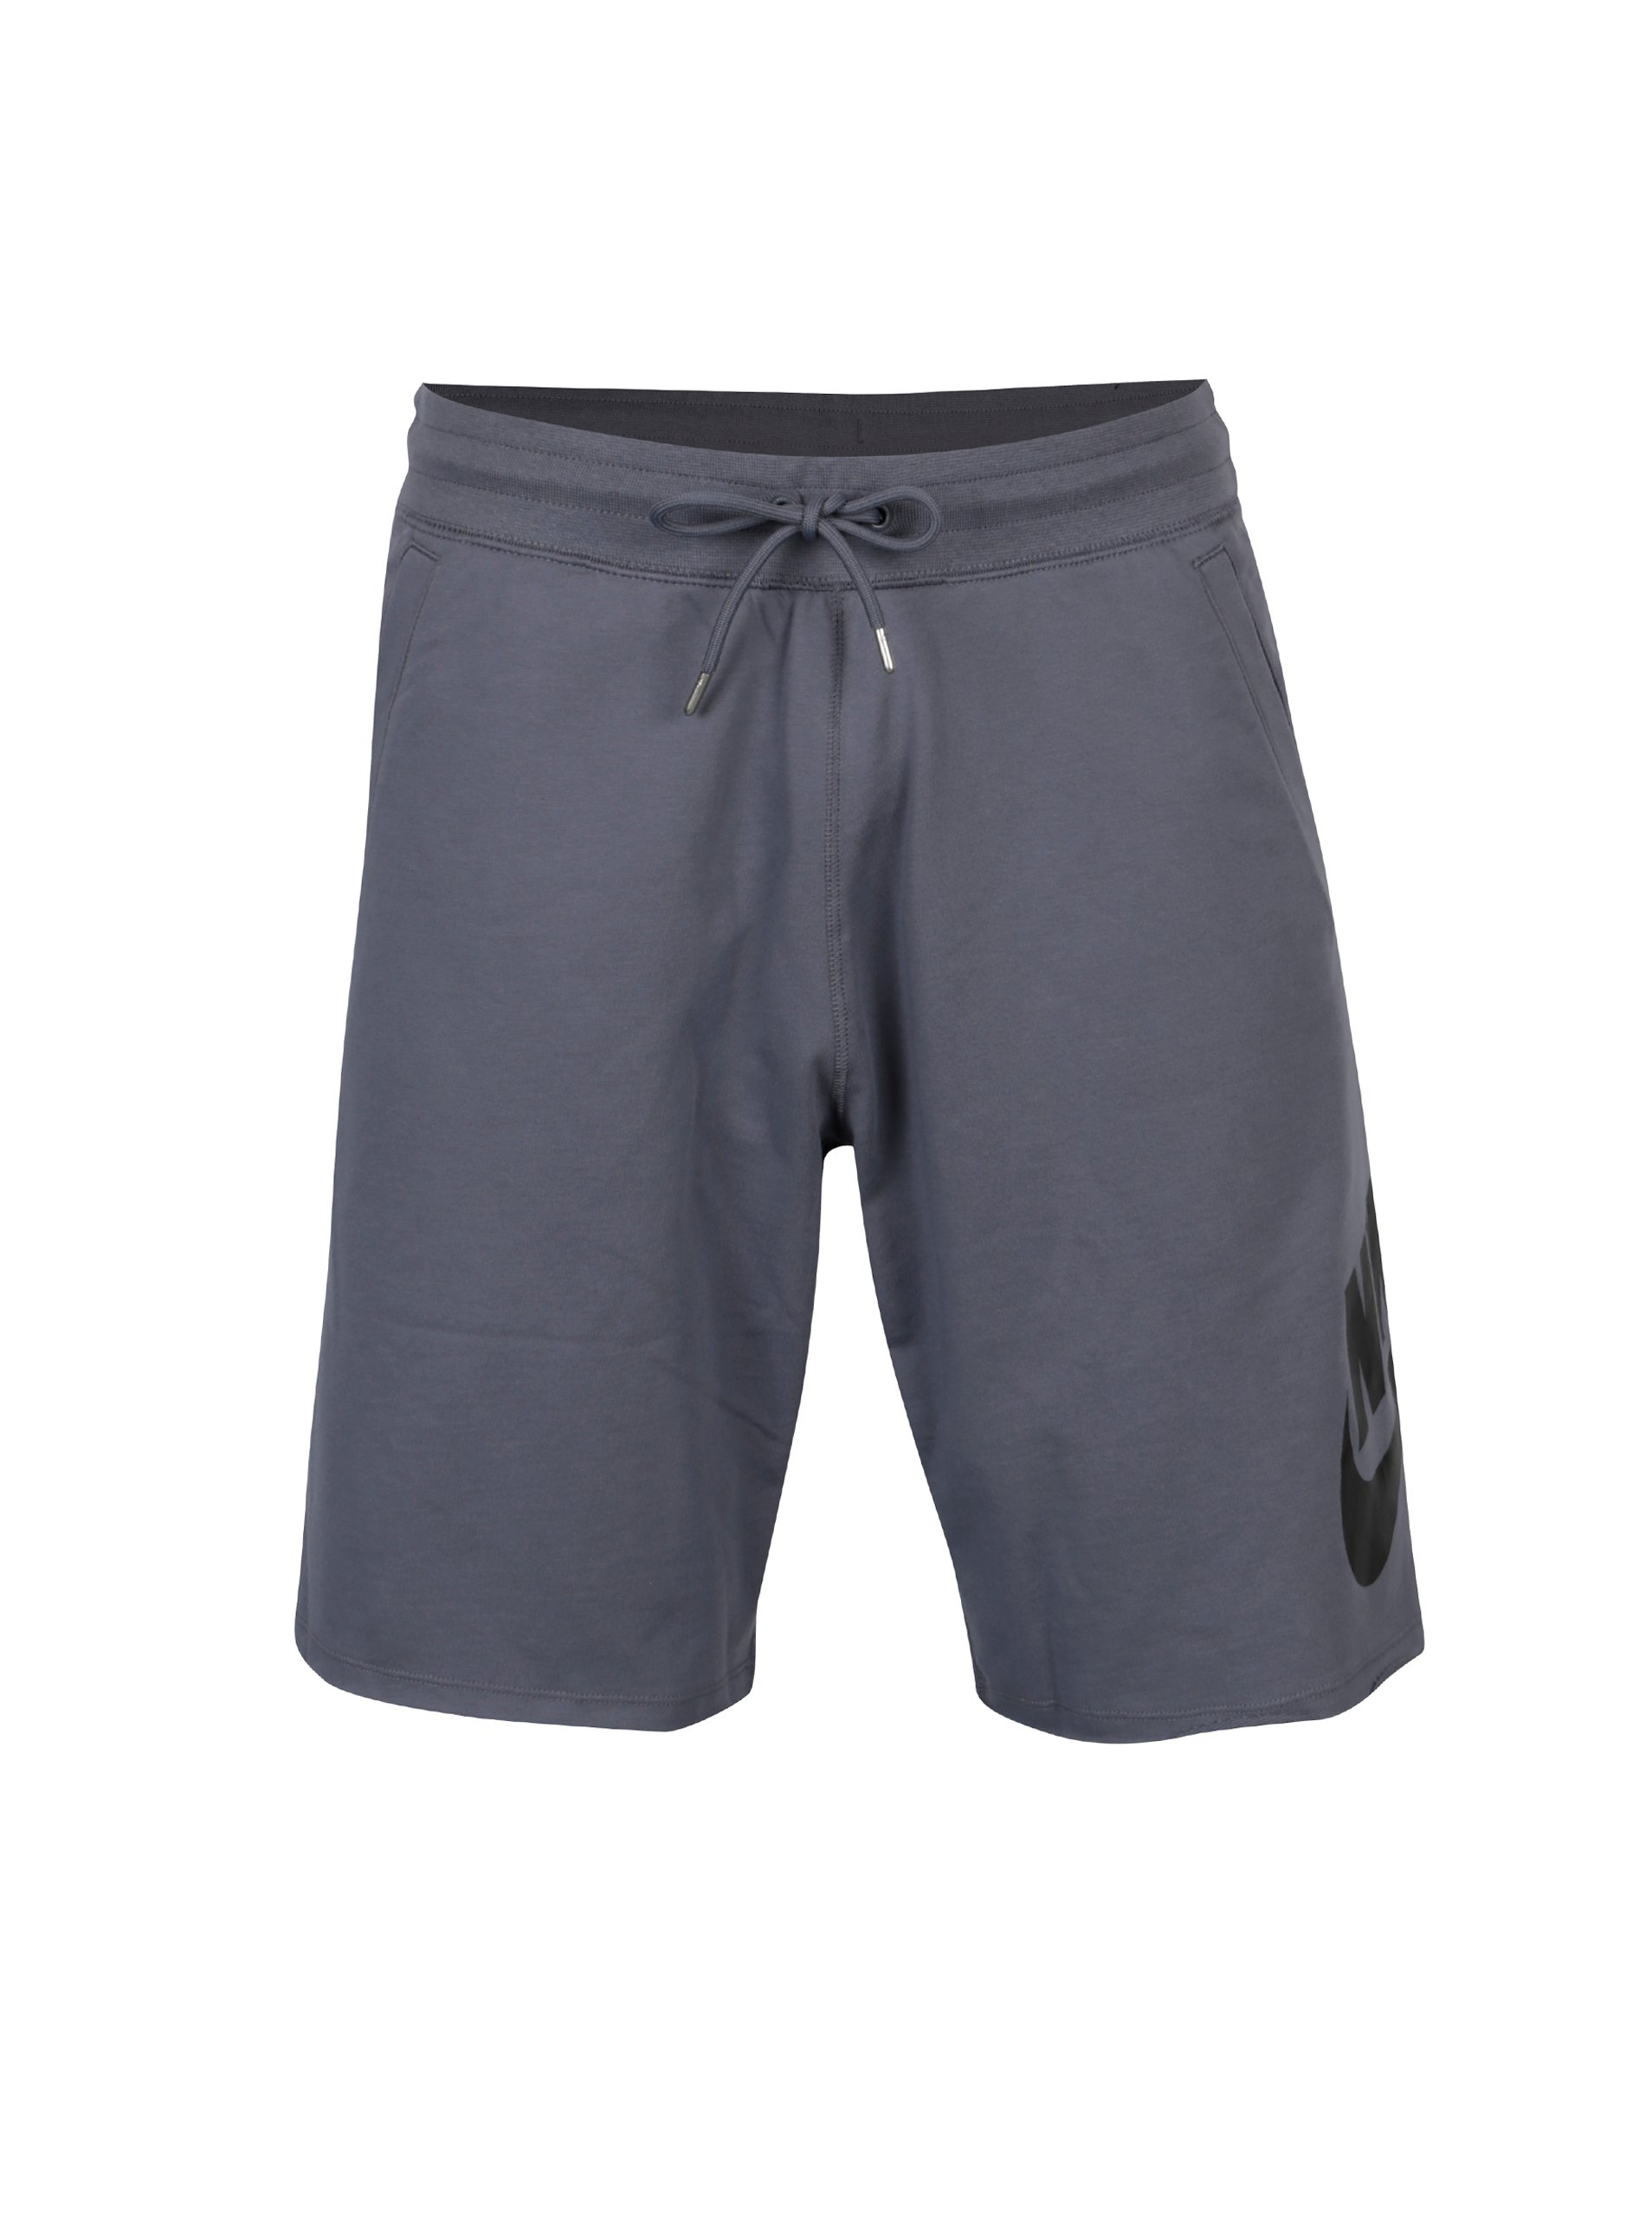 Šedé pánské teplákové loose fit kraťasy Nike